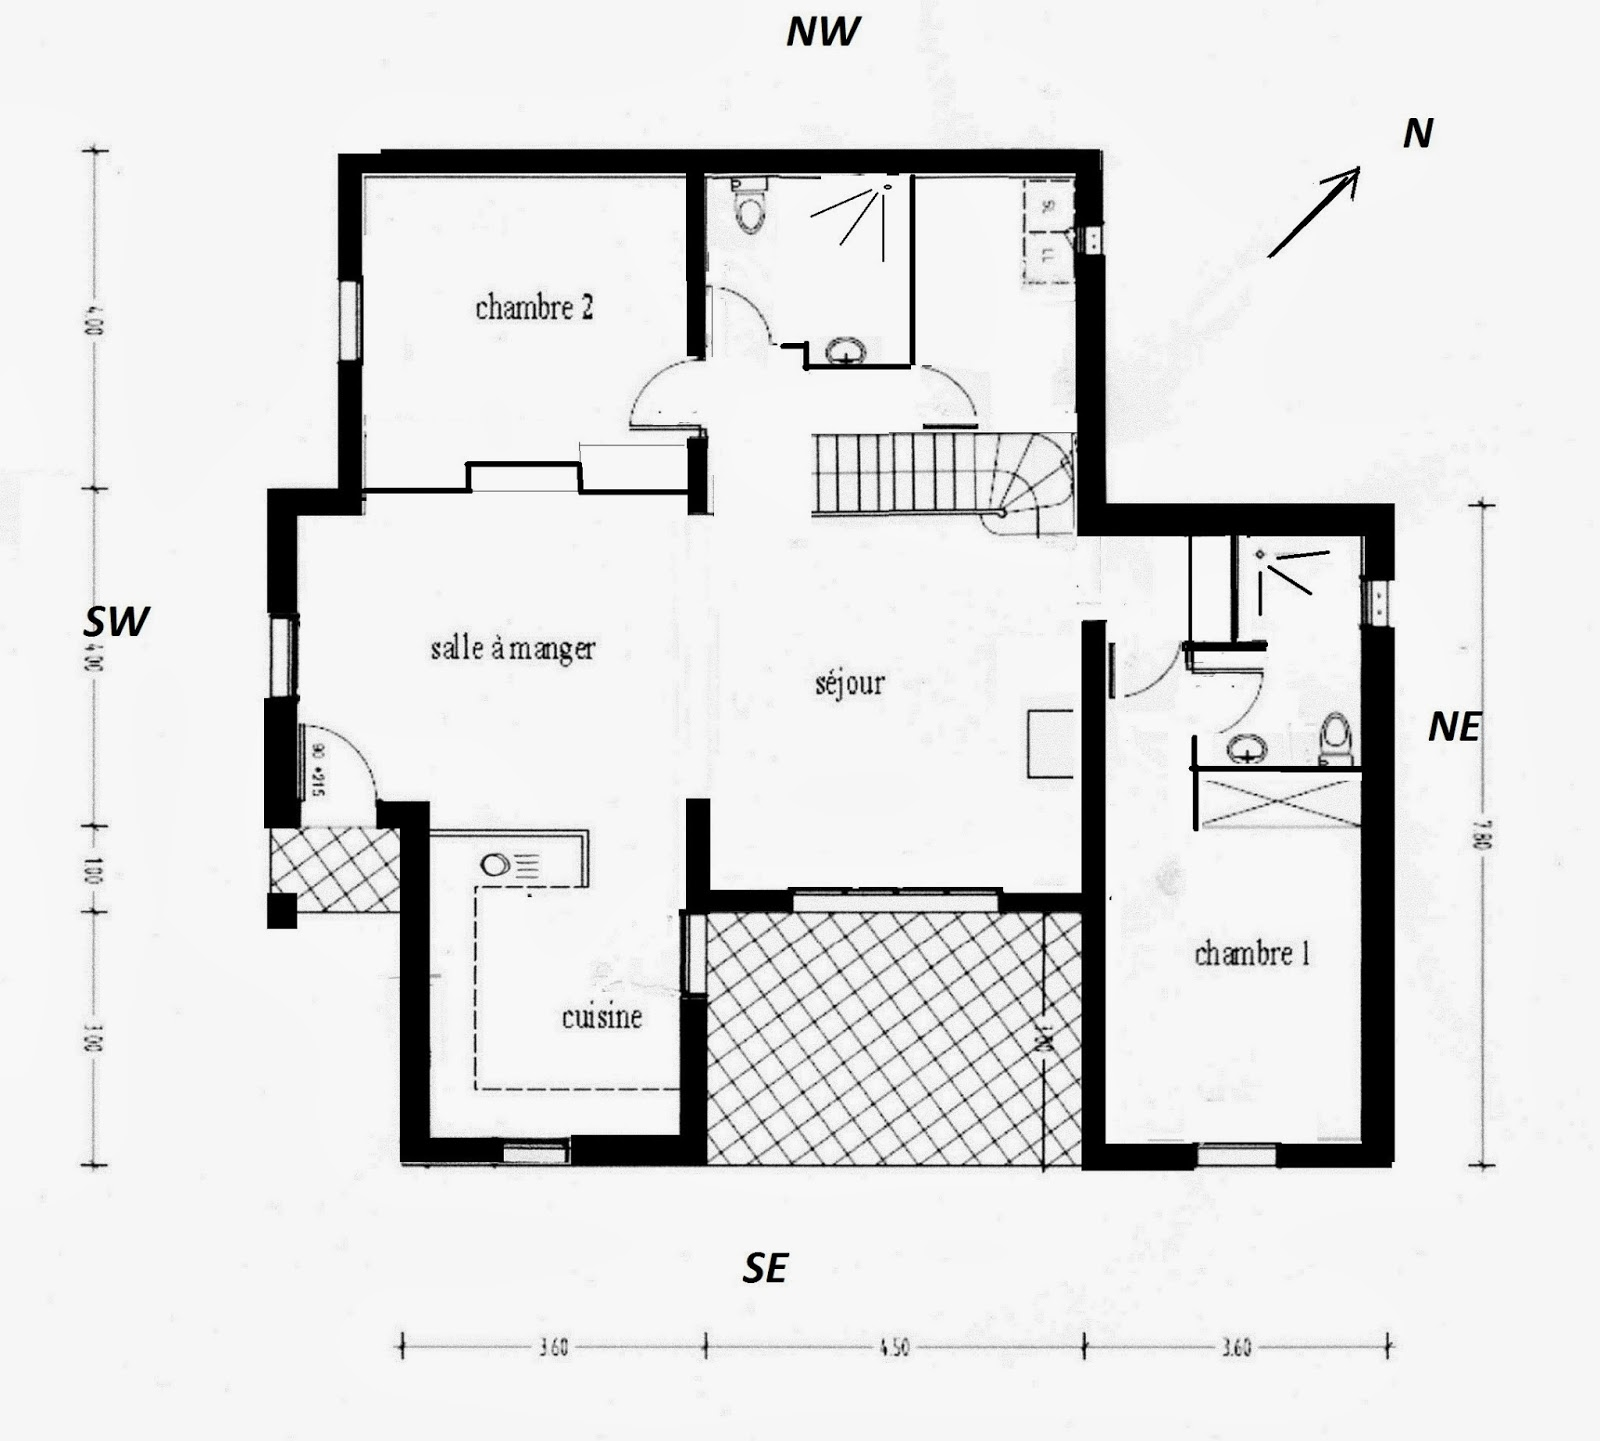 Portable Farrowing House Plans : Photo farrowing house plans images hog